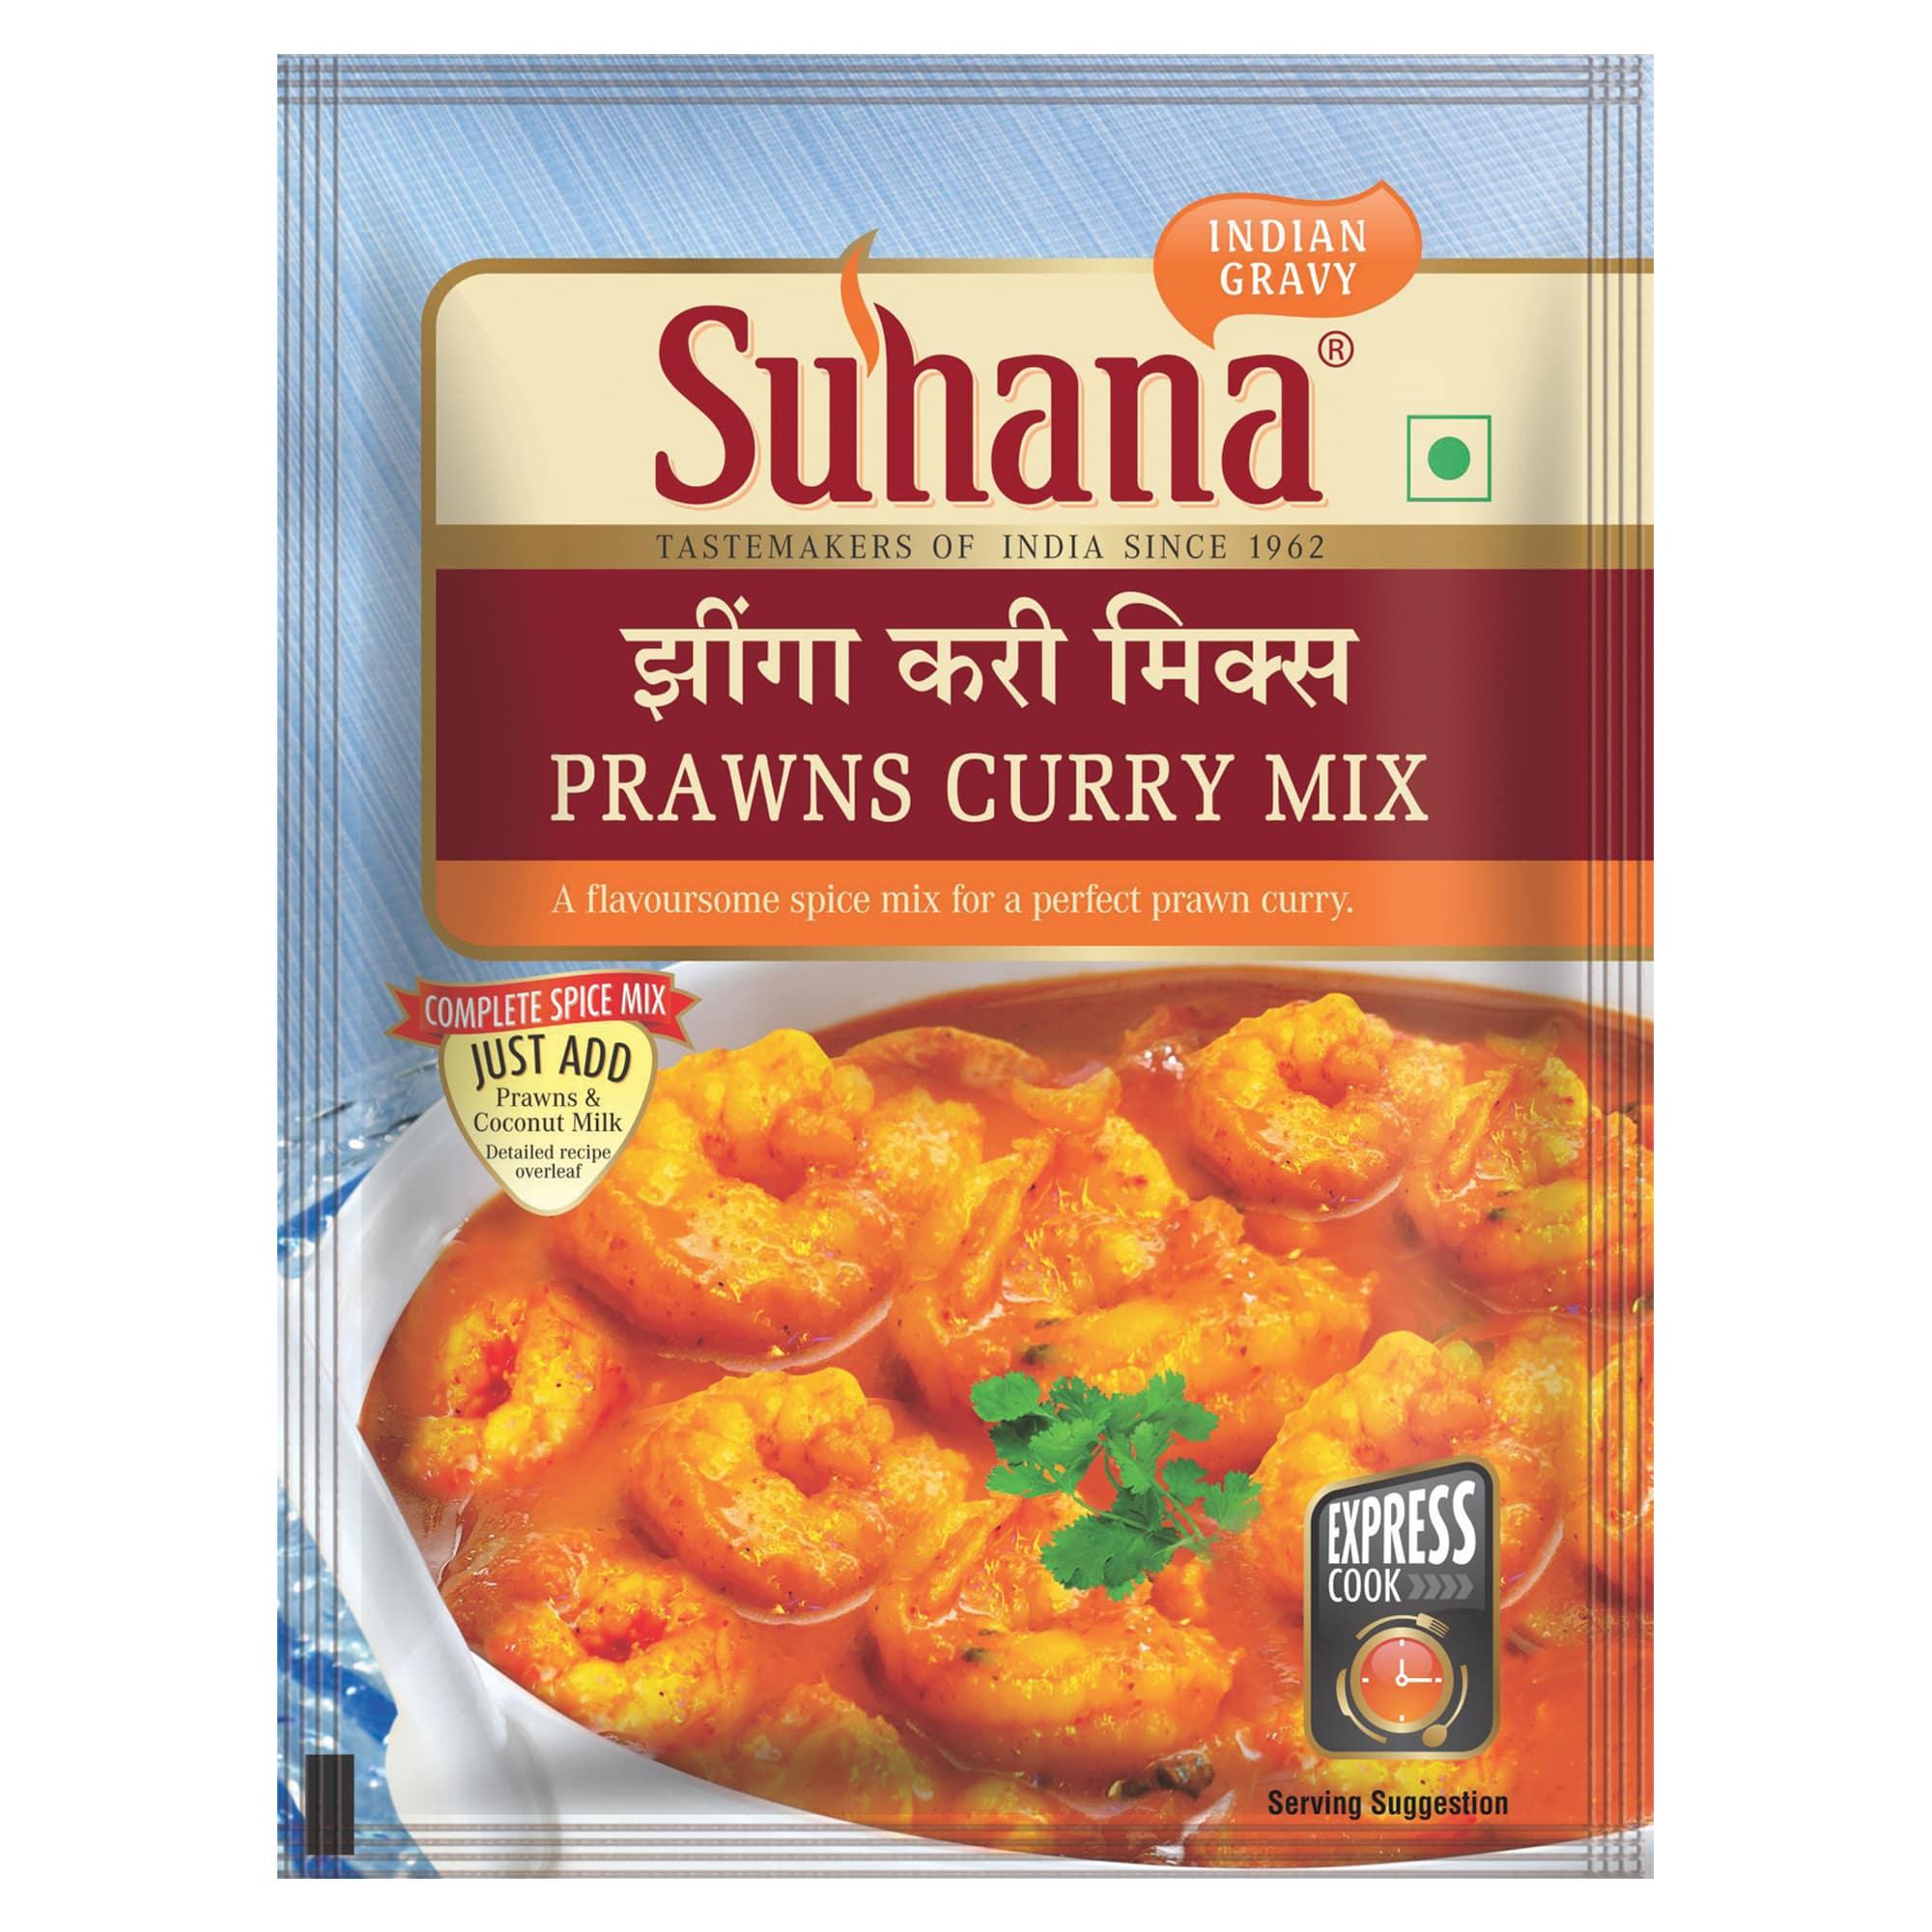 Suhana Prawn Curry Spice Mix 50g Pouch